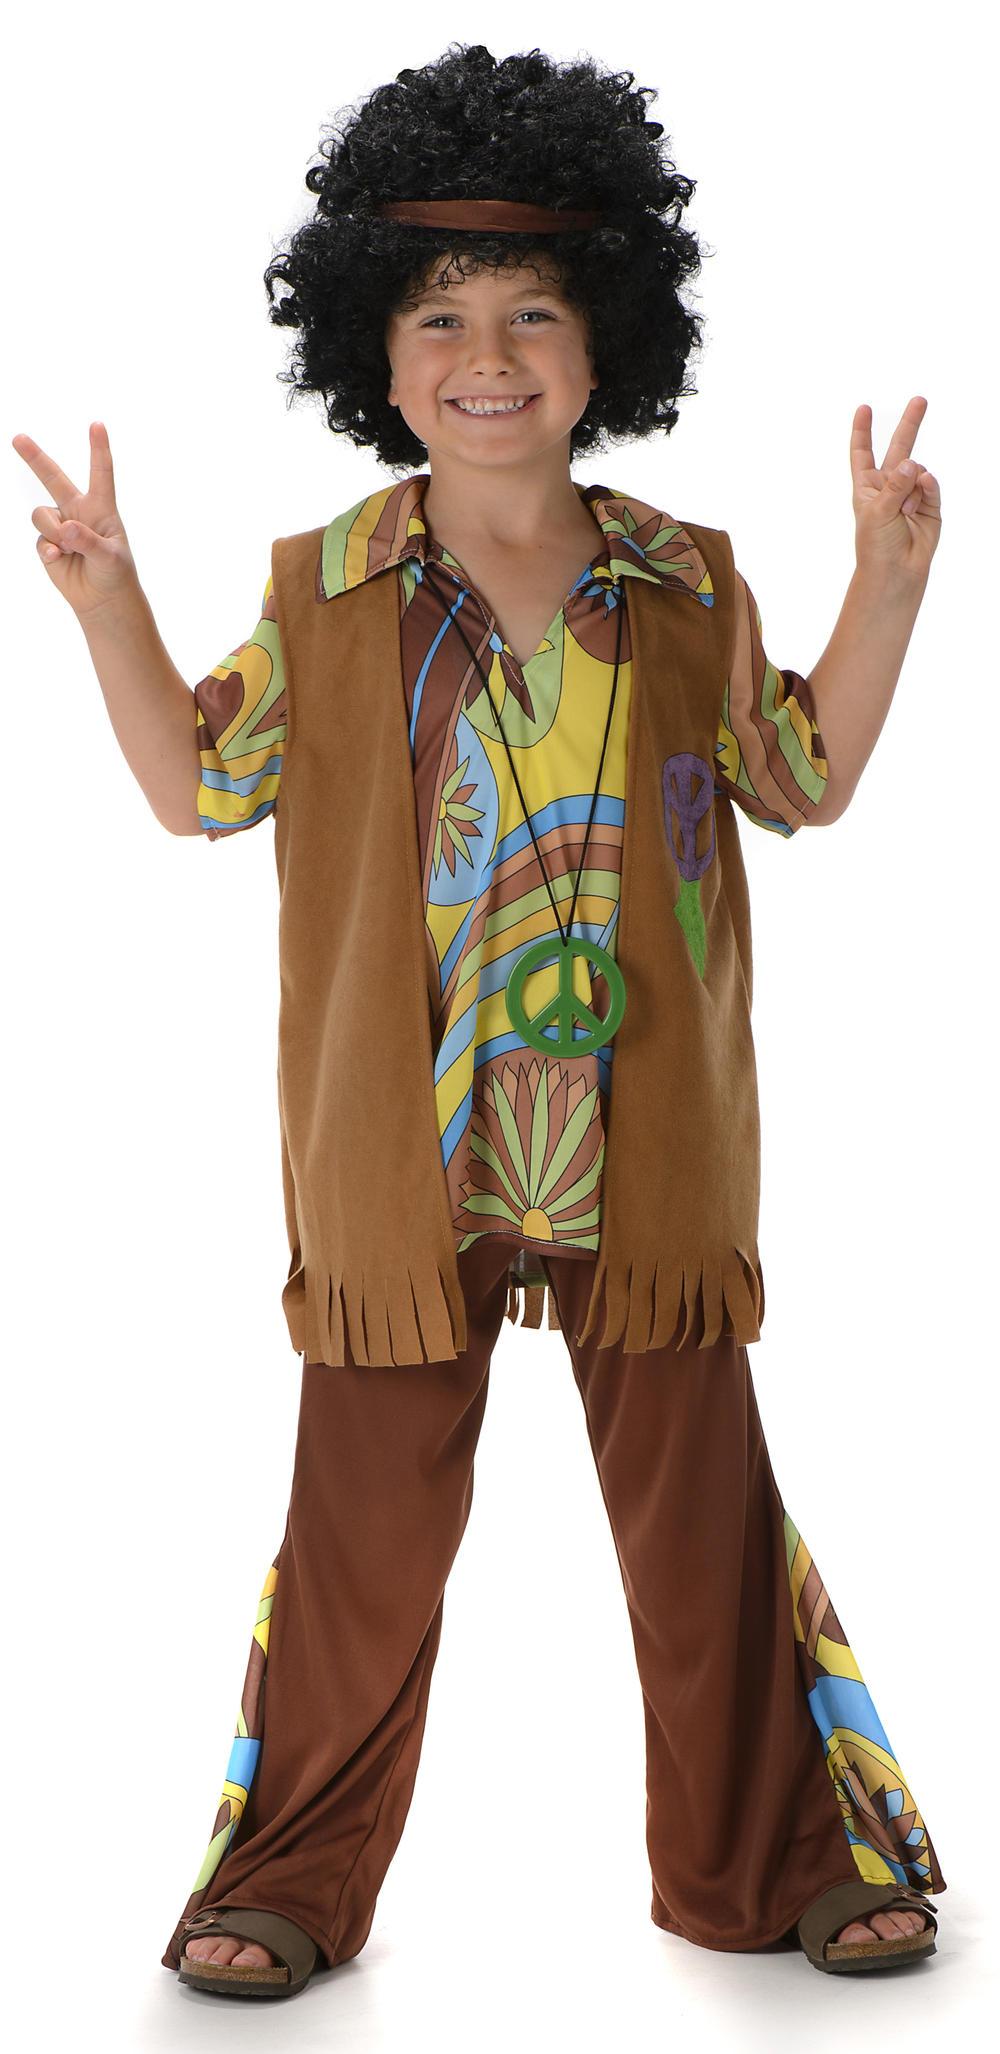 Boys Hippie Fancy Dress 1960s 70s Groovy Childs Childrens Kids Hippy Costume New